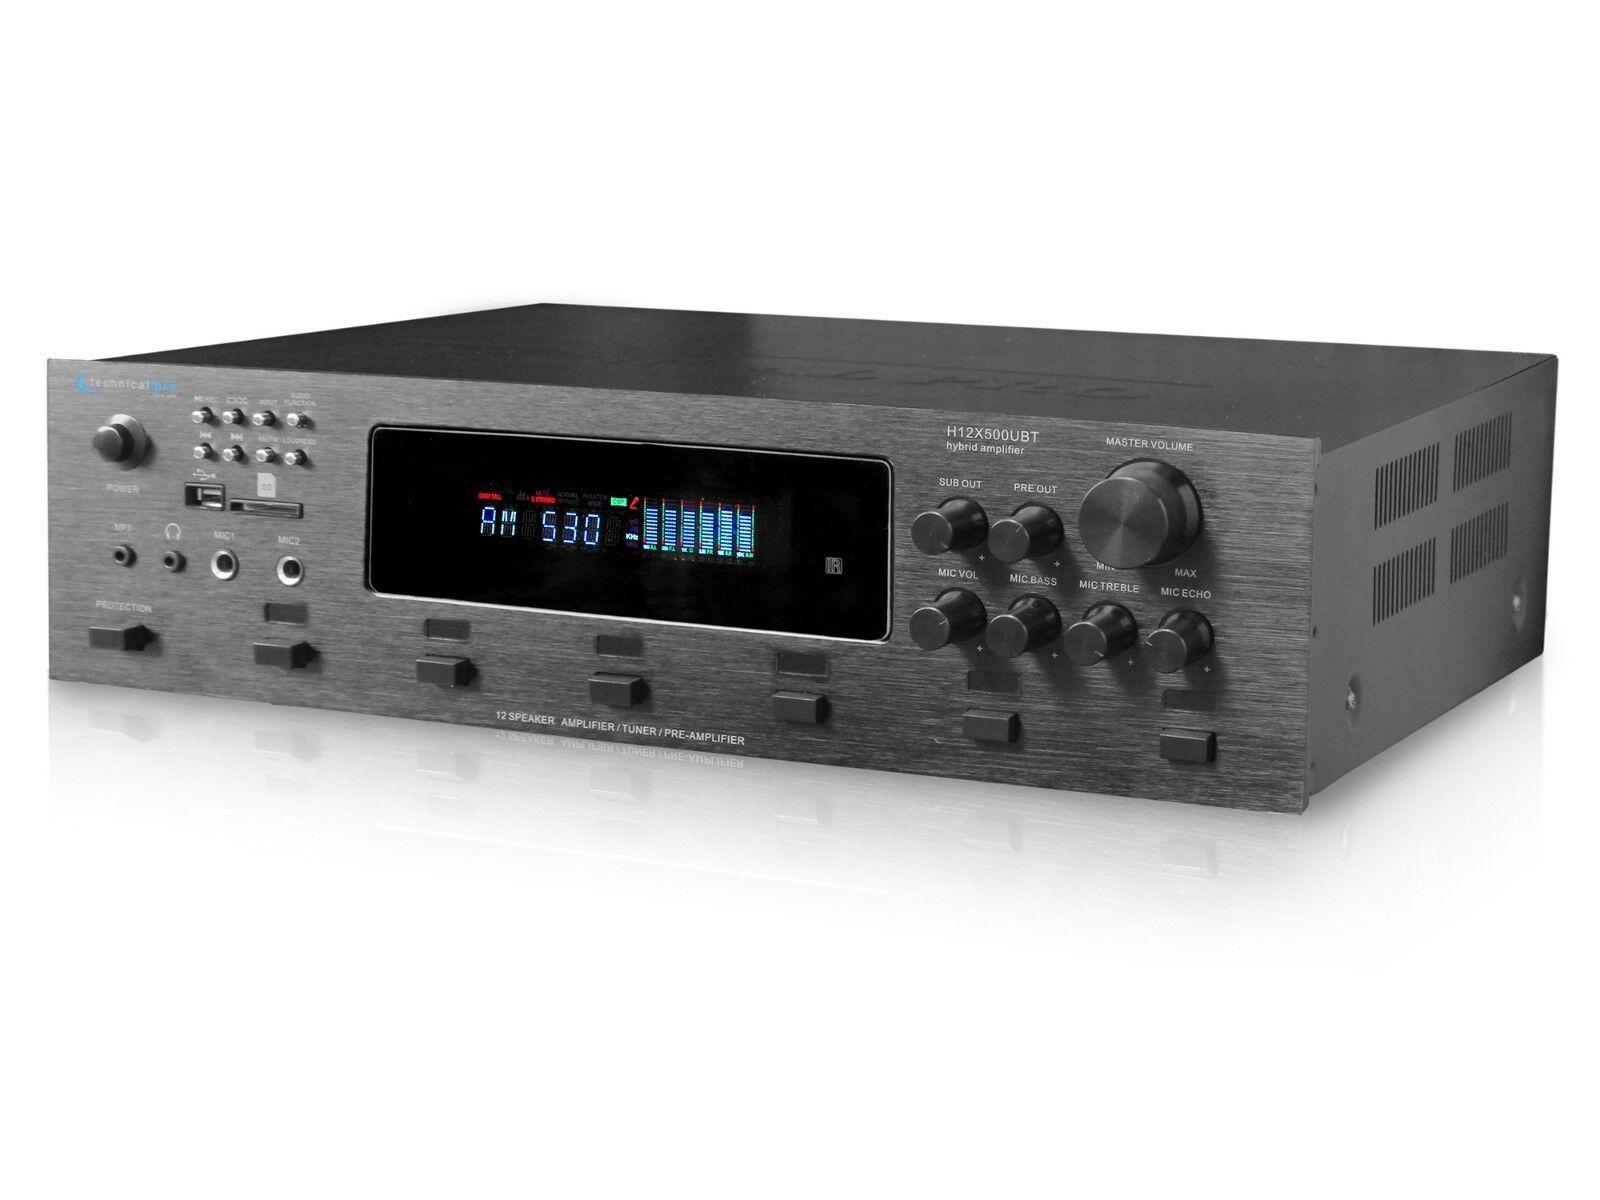 Technical Pro H12X500BT 6000w Amplifier / Preamp/ Tuner w/ 12 Speaker+Microphone